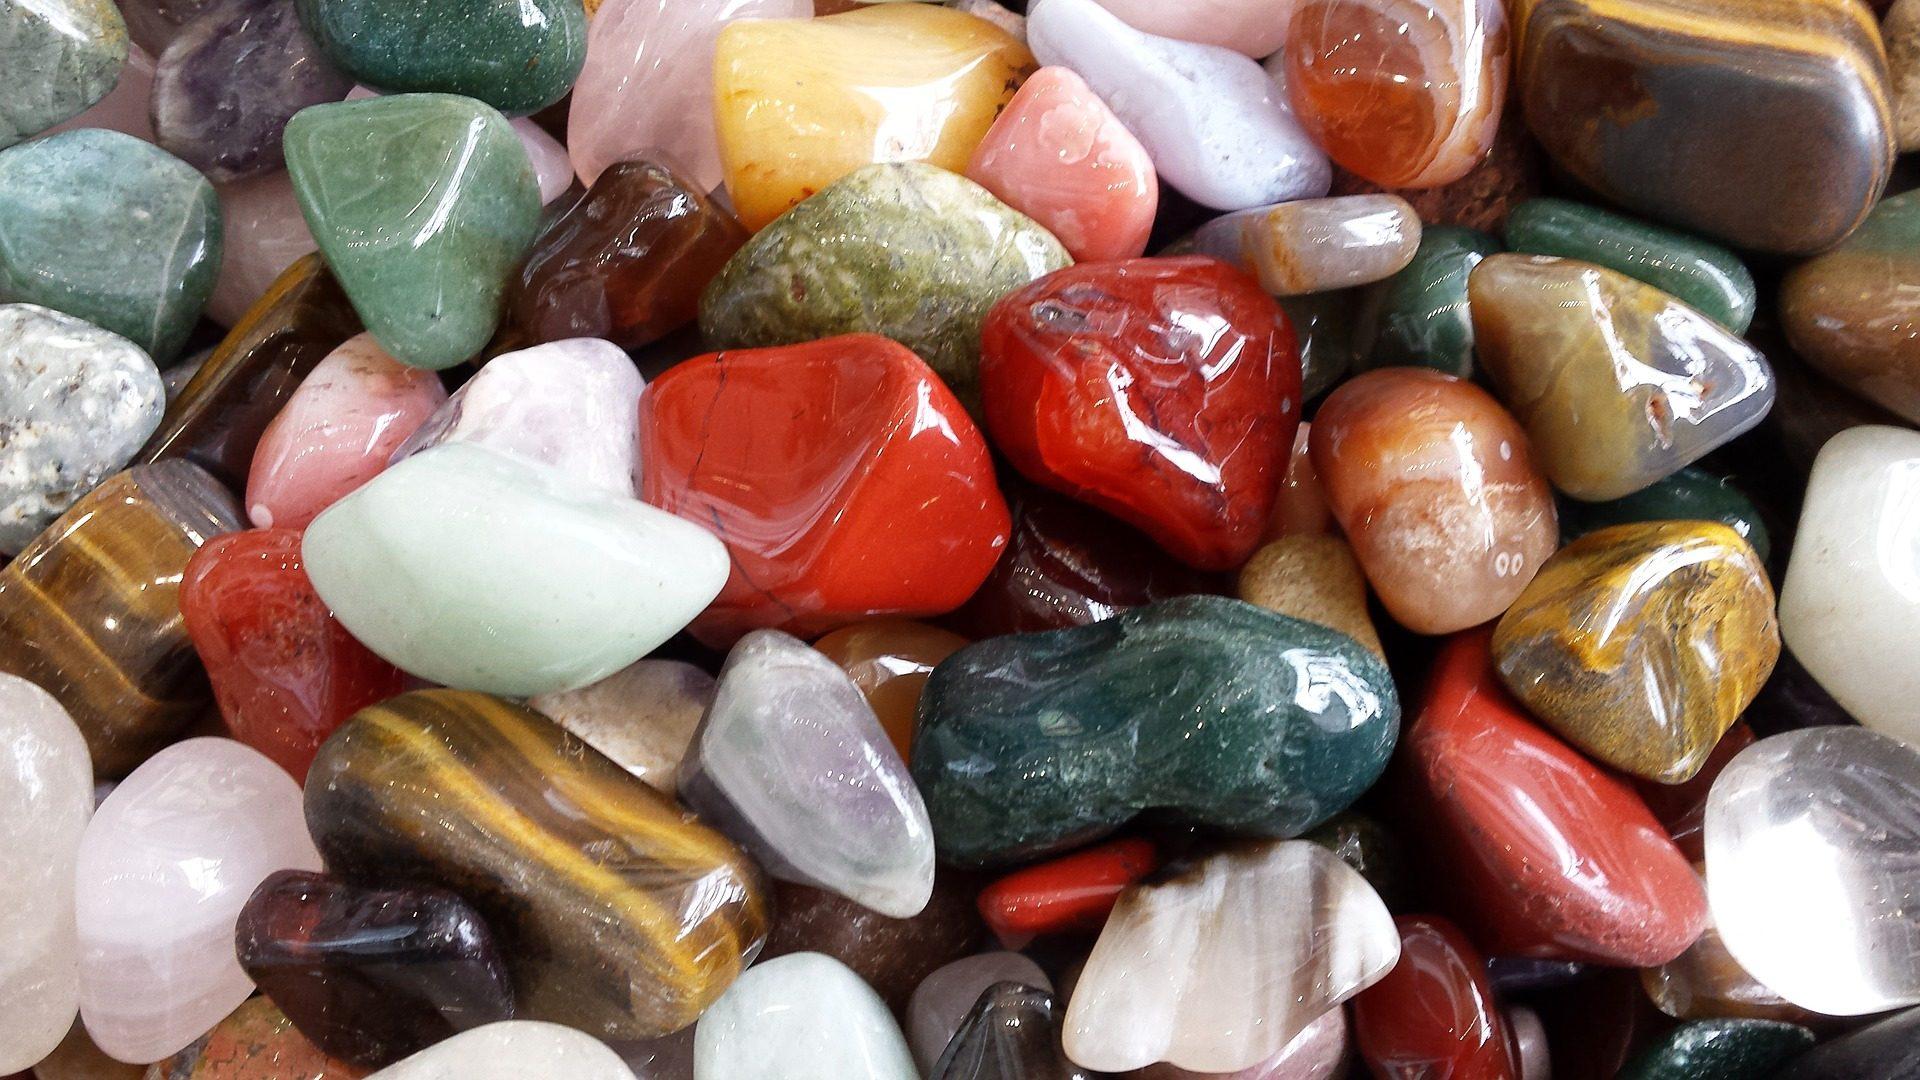 pedras, Rocas, brillos, colorido, diversidade - Papéis de parede HD - Professor-falken.com